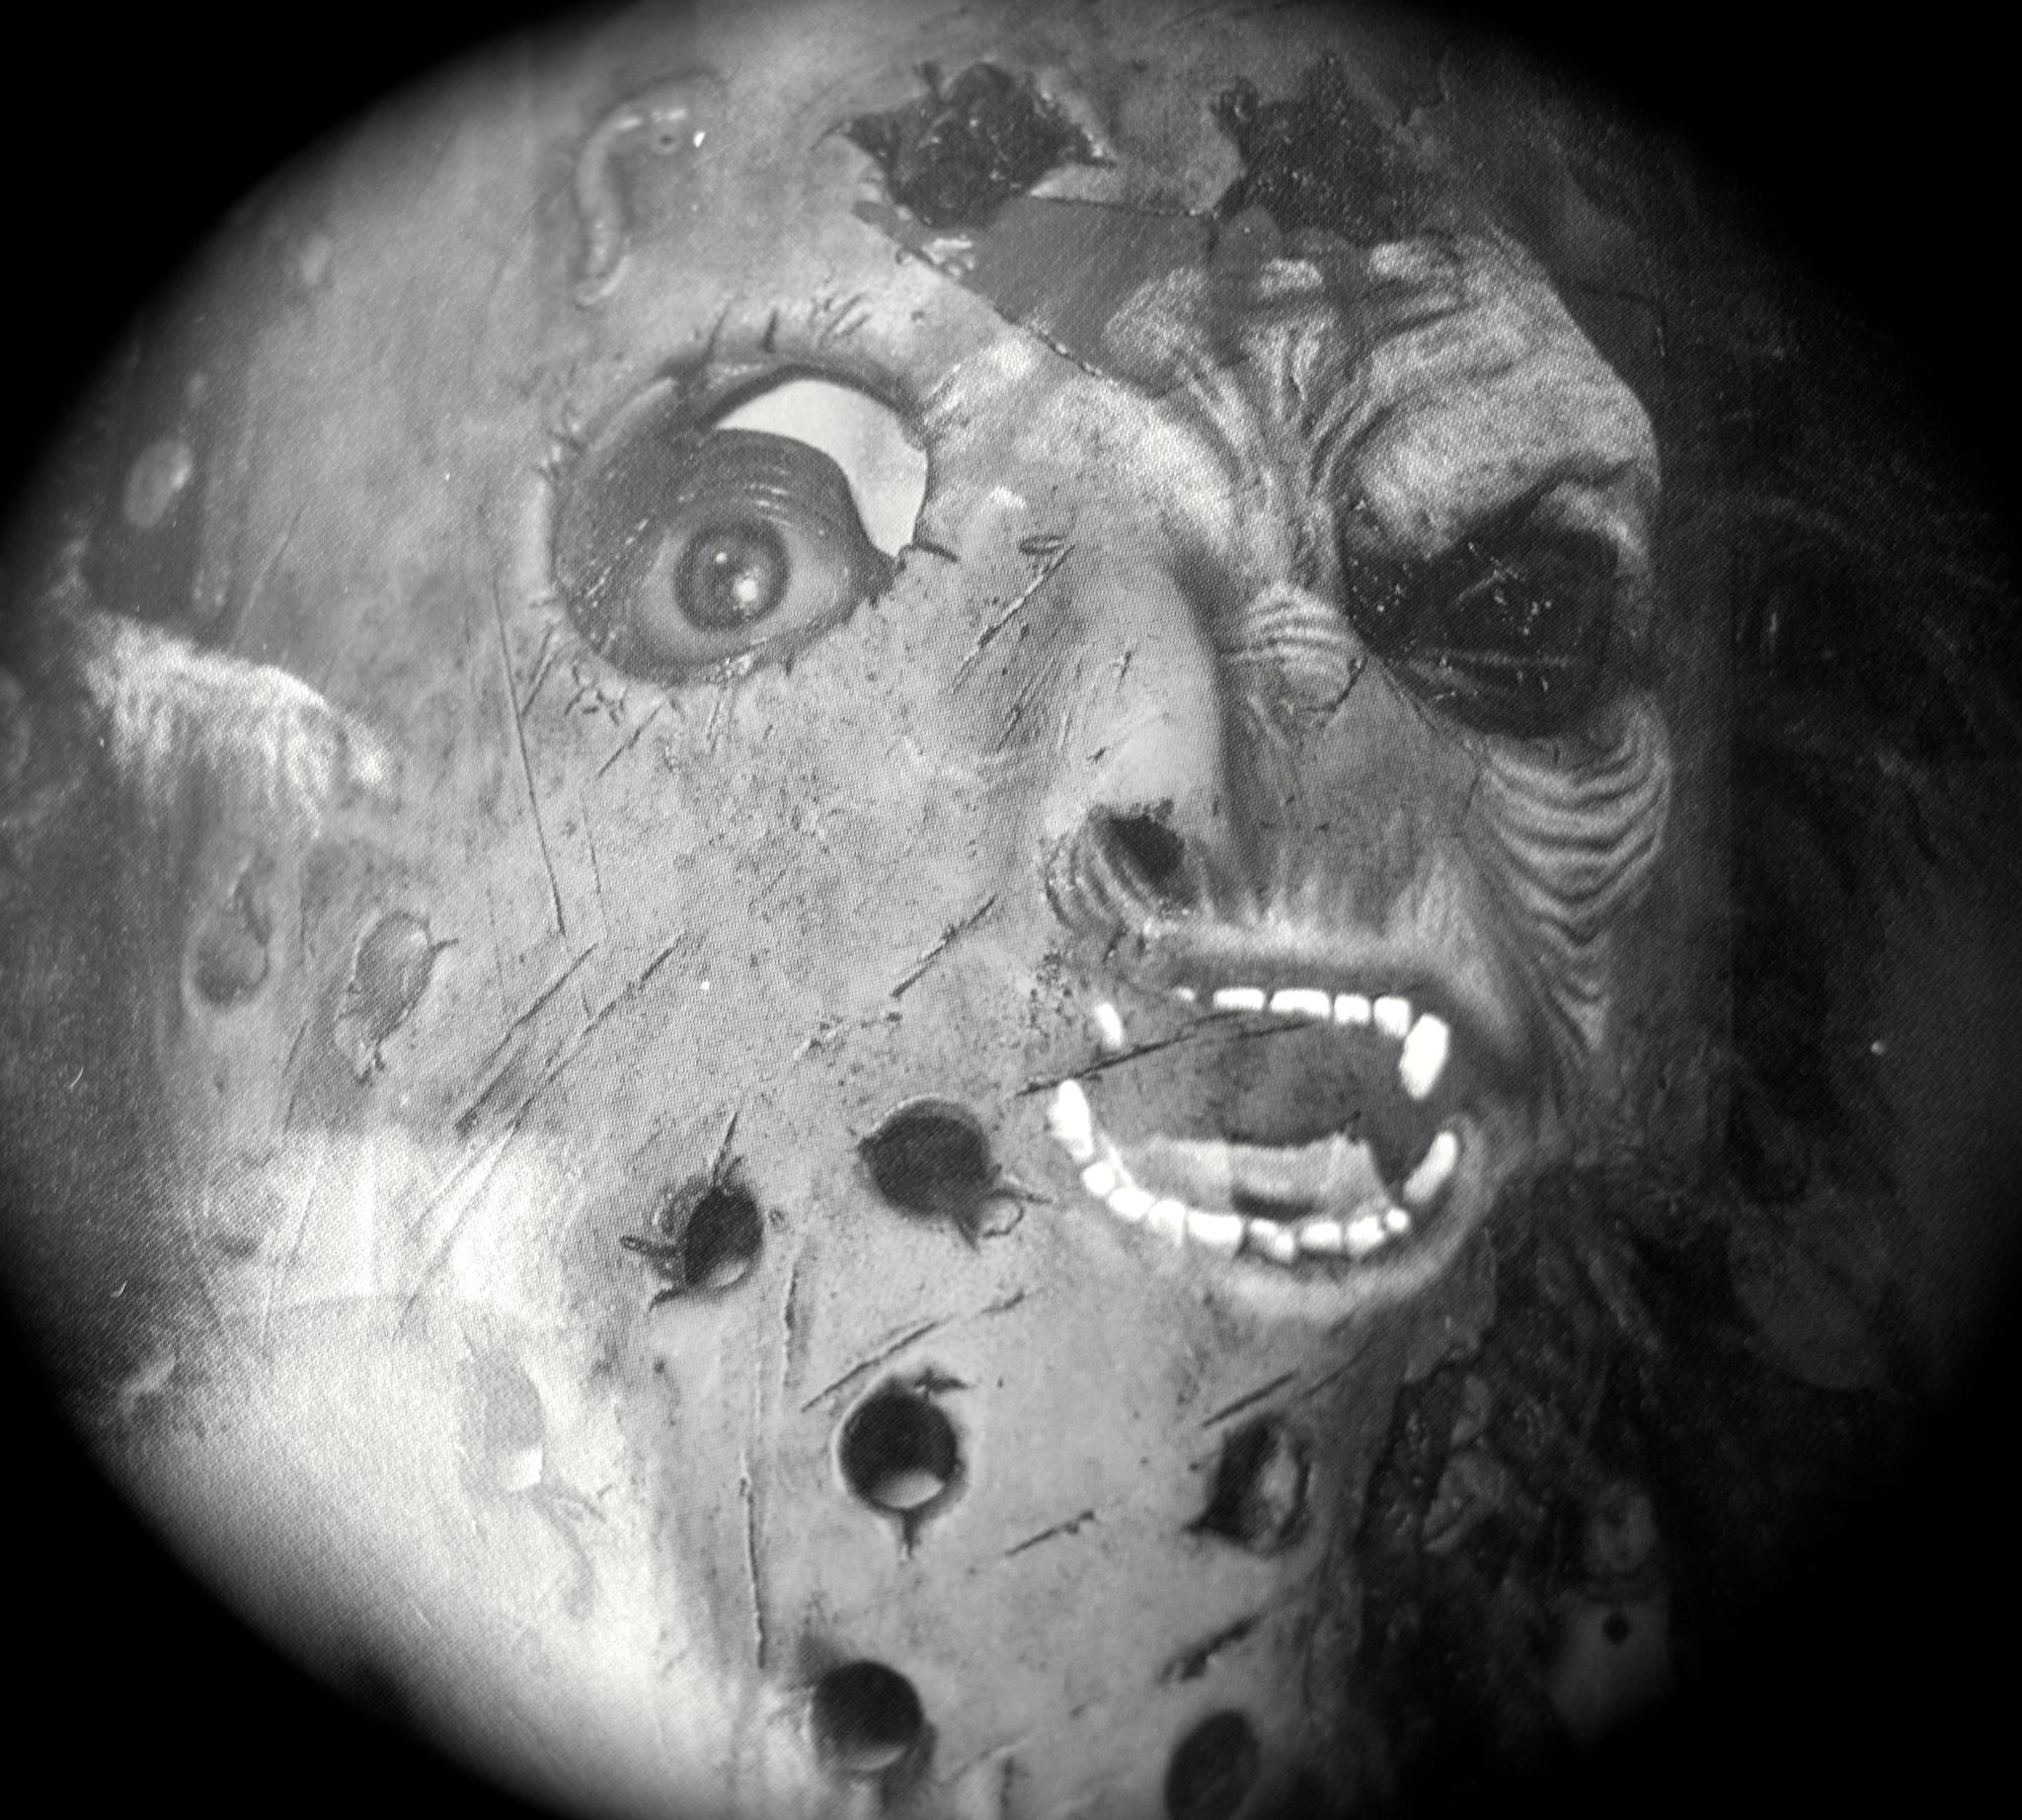 Monster Mash by Richardturner121